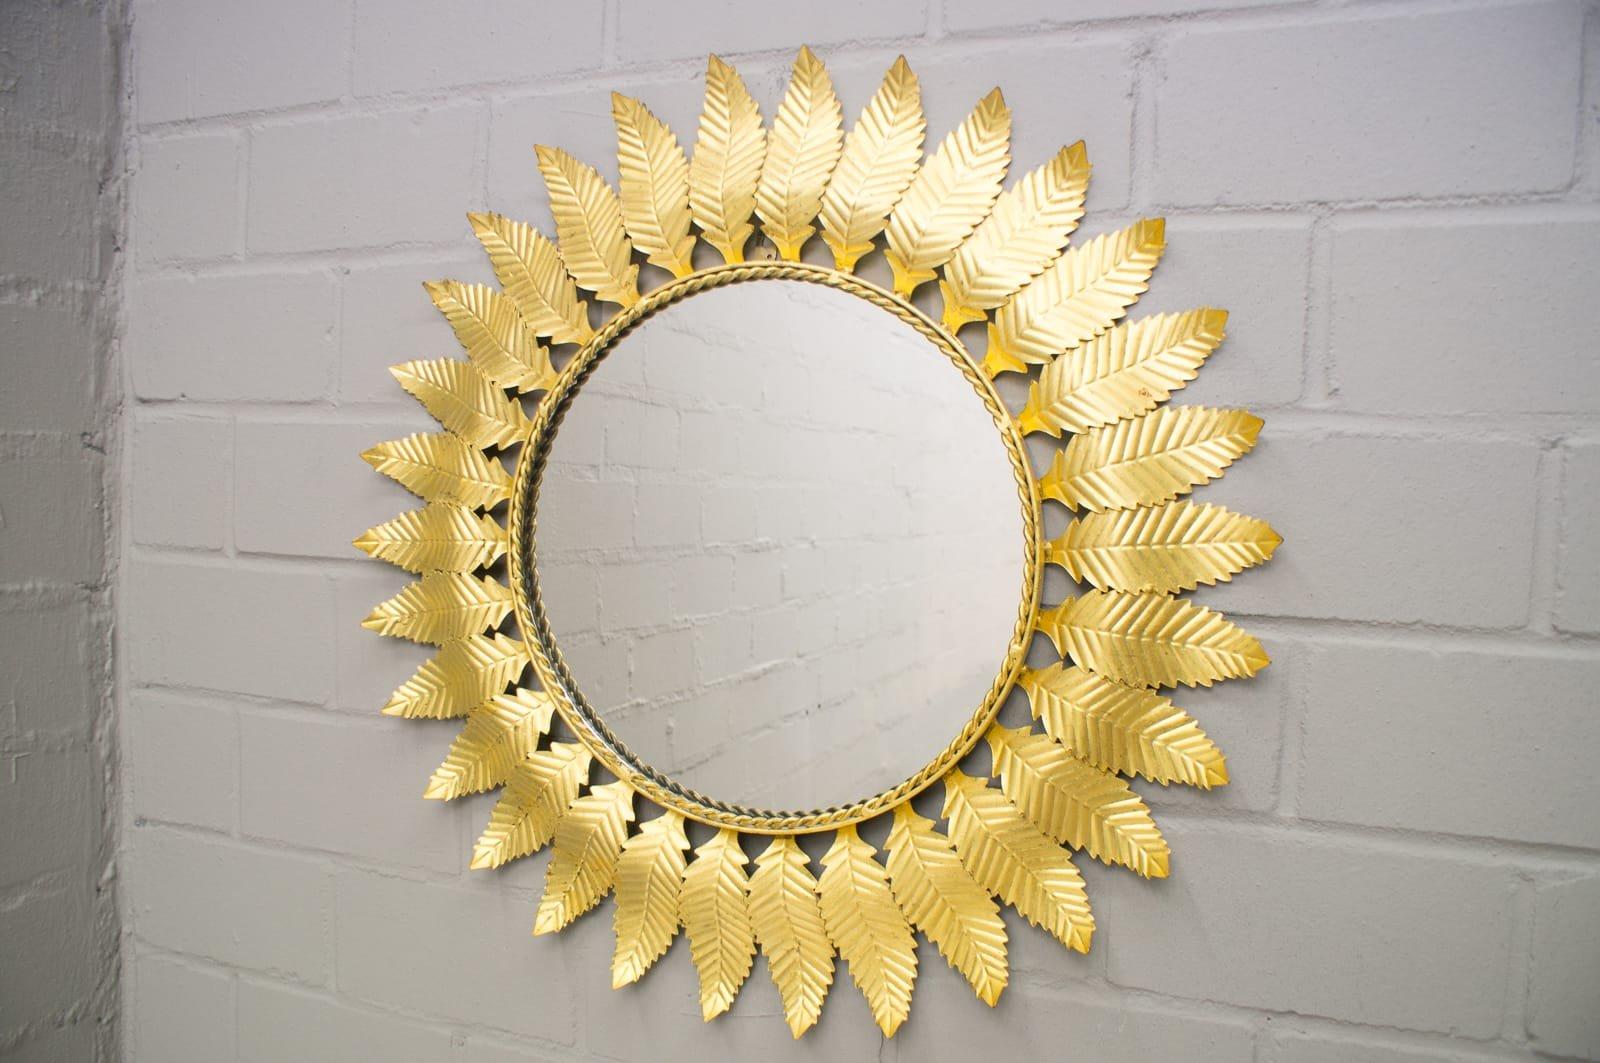 Brass Leaf Sunburst Mirror, 1960s for sale at Pamono